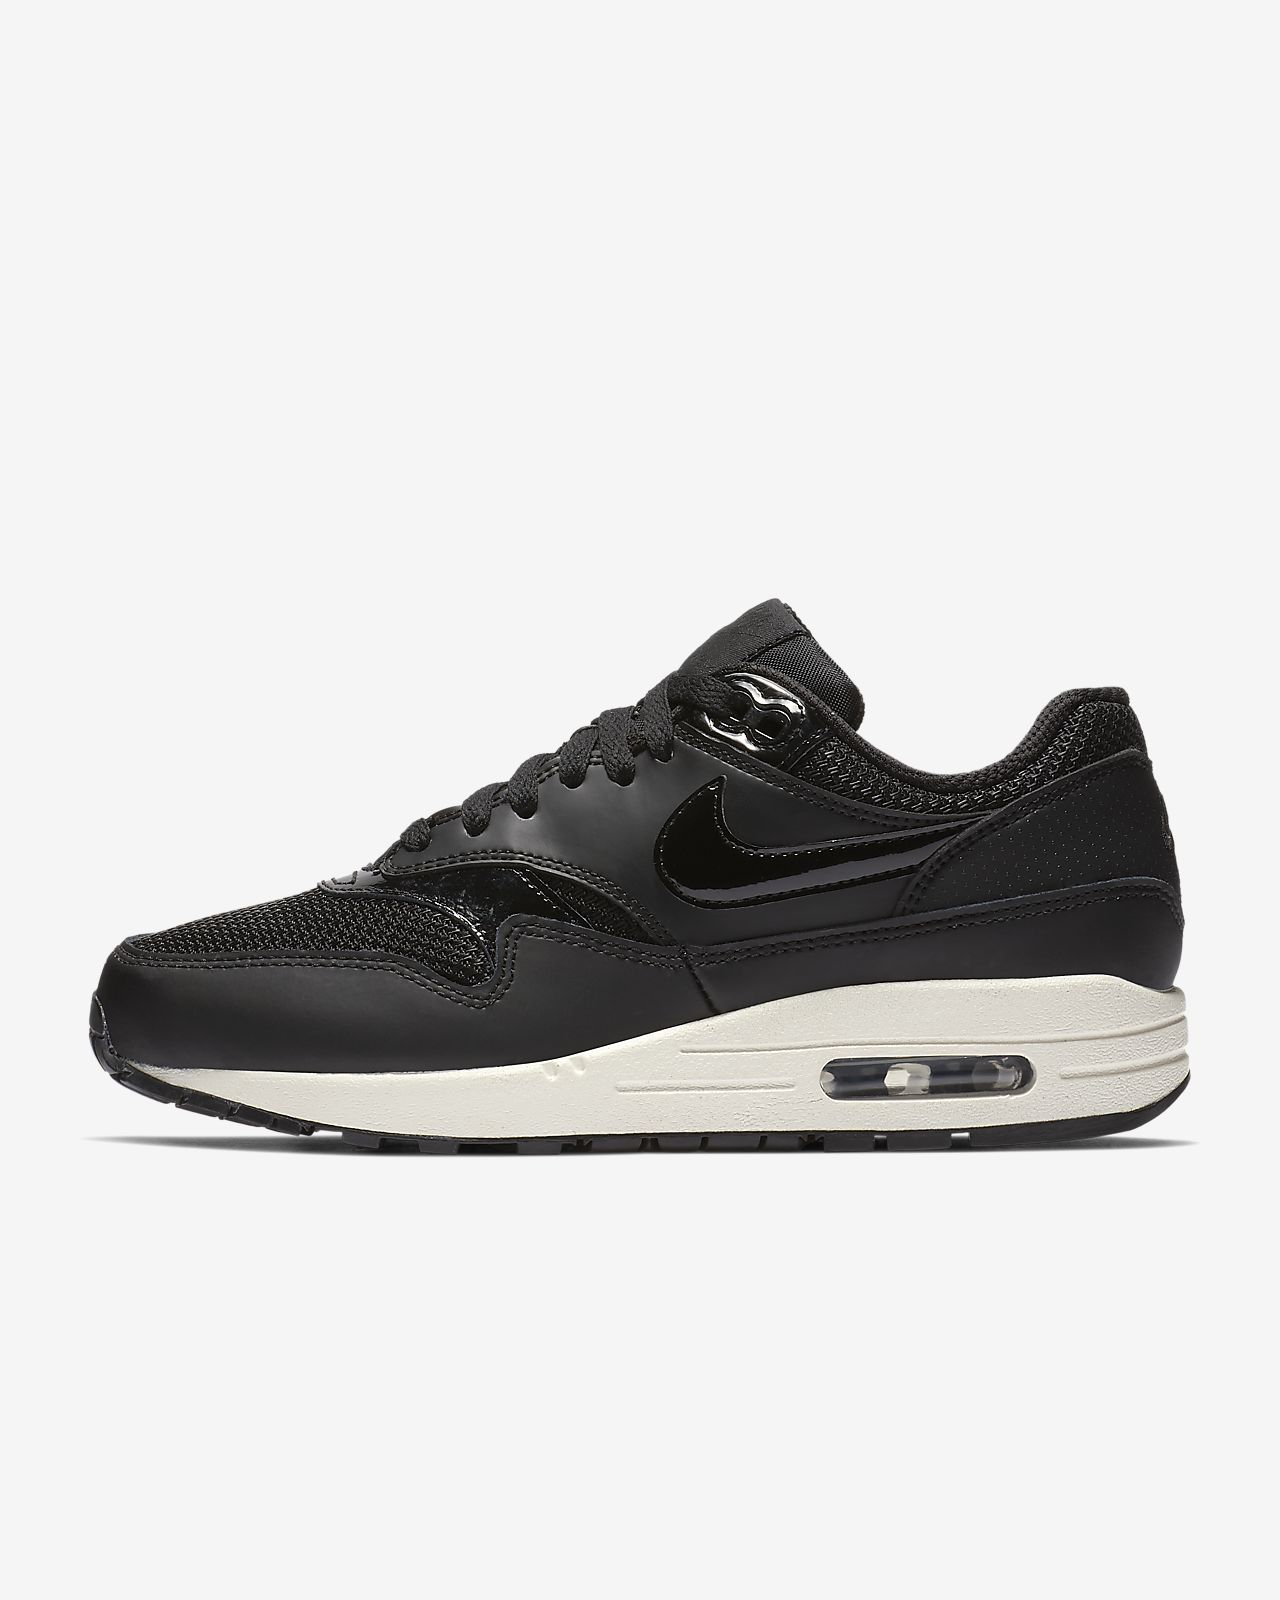 low priced 57cdf 5e1a0 Women s Shoe. Nike Air Max 1